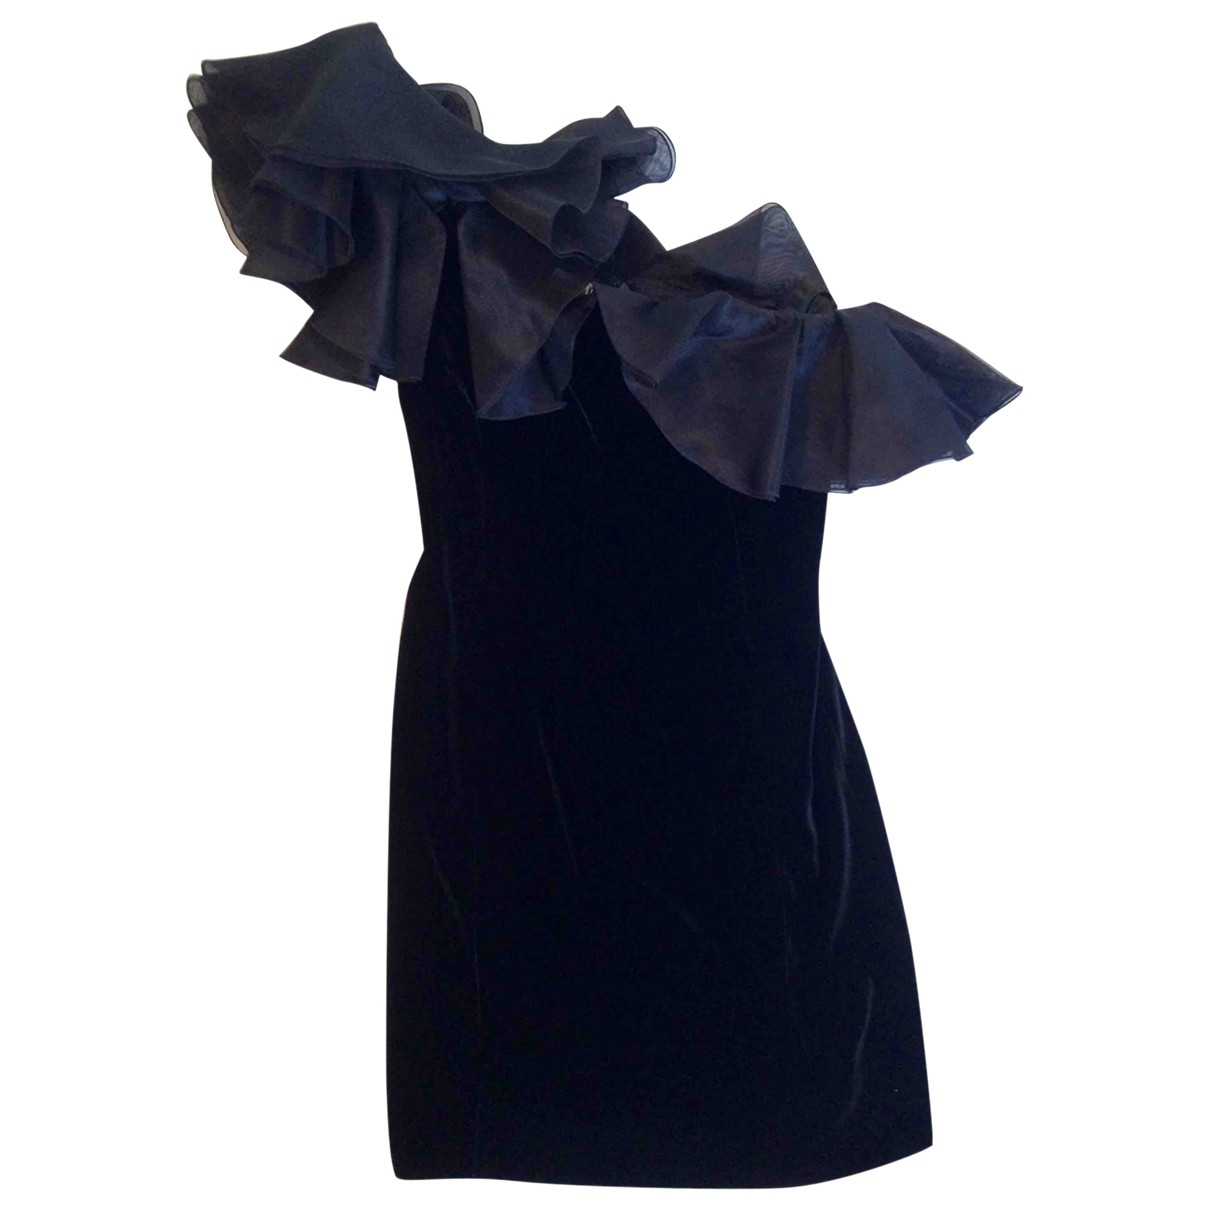 Armani Collezioni \N Black Velvet dress for Women 38 IT